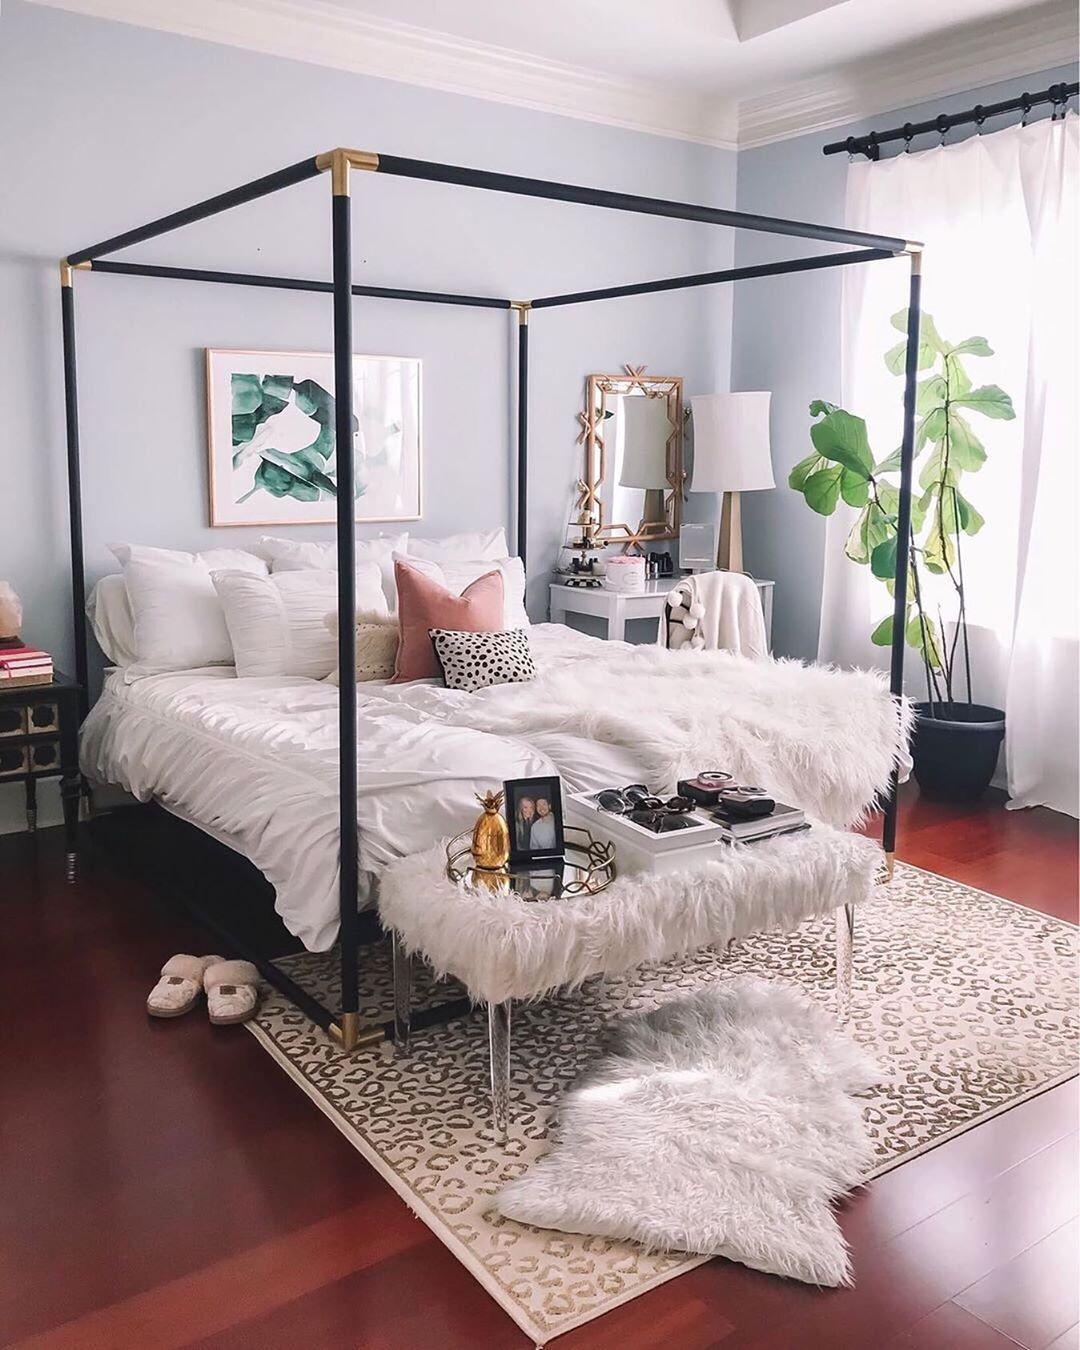 Pin By Emma L On Bedroom Ideas In 2020 Glam Bedroom Glam Bedroom Decor Modern Bedroom Furniture